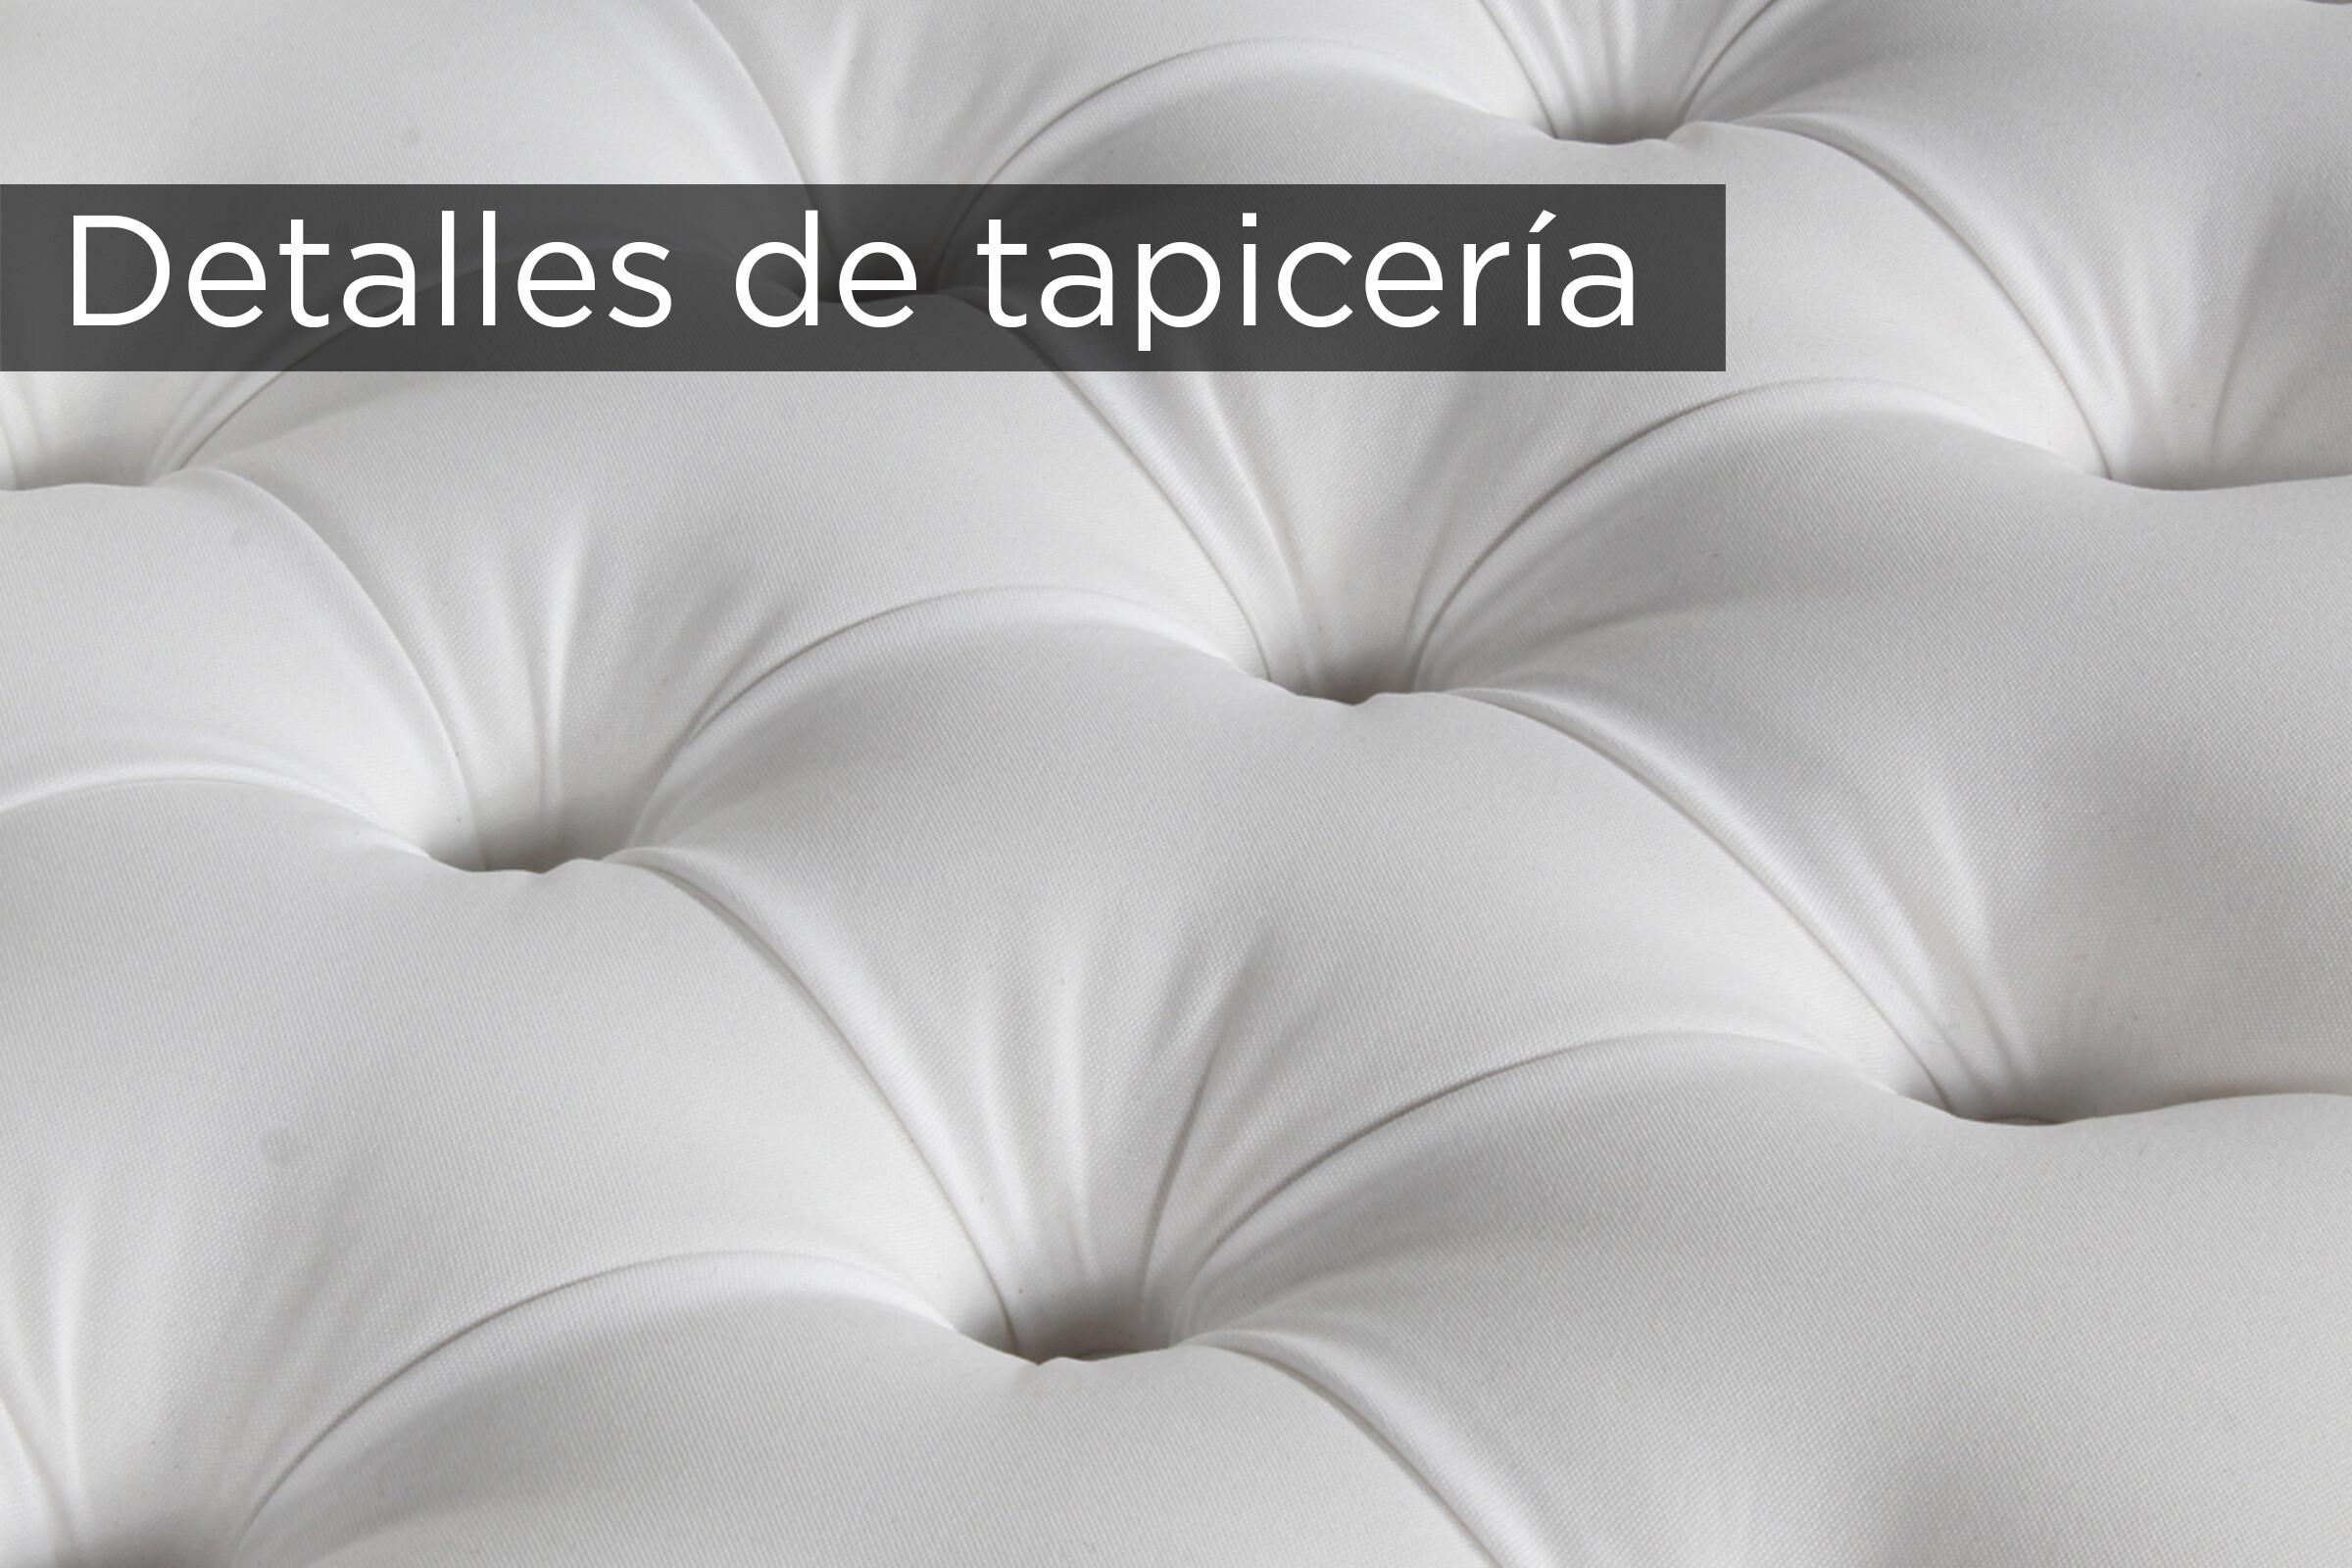 Detalles De Tapiceria